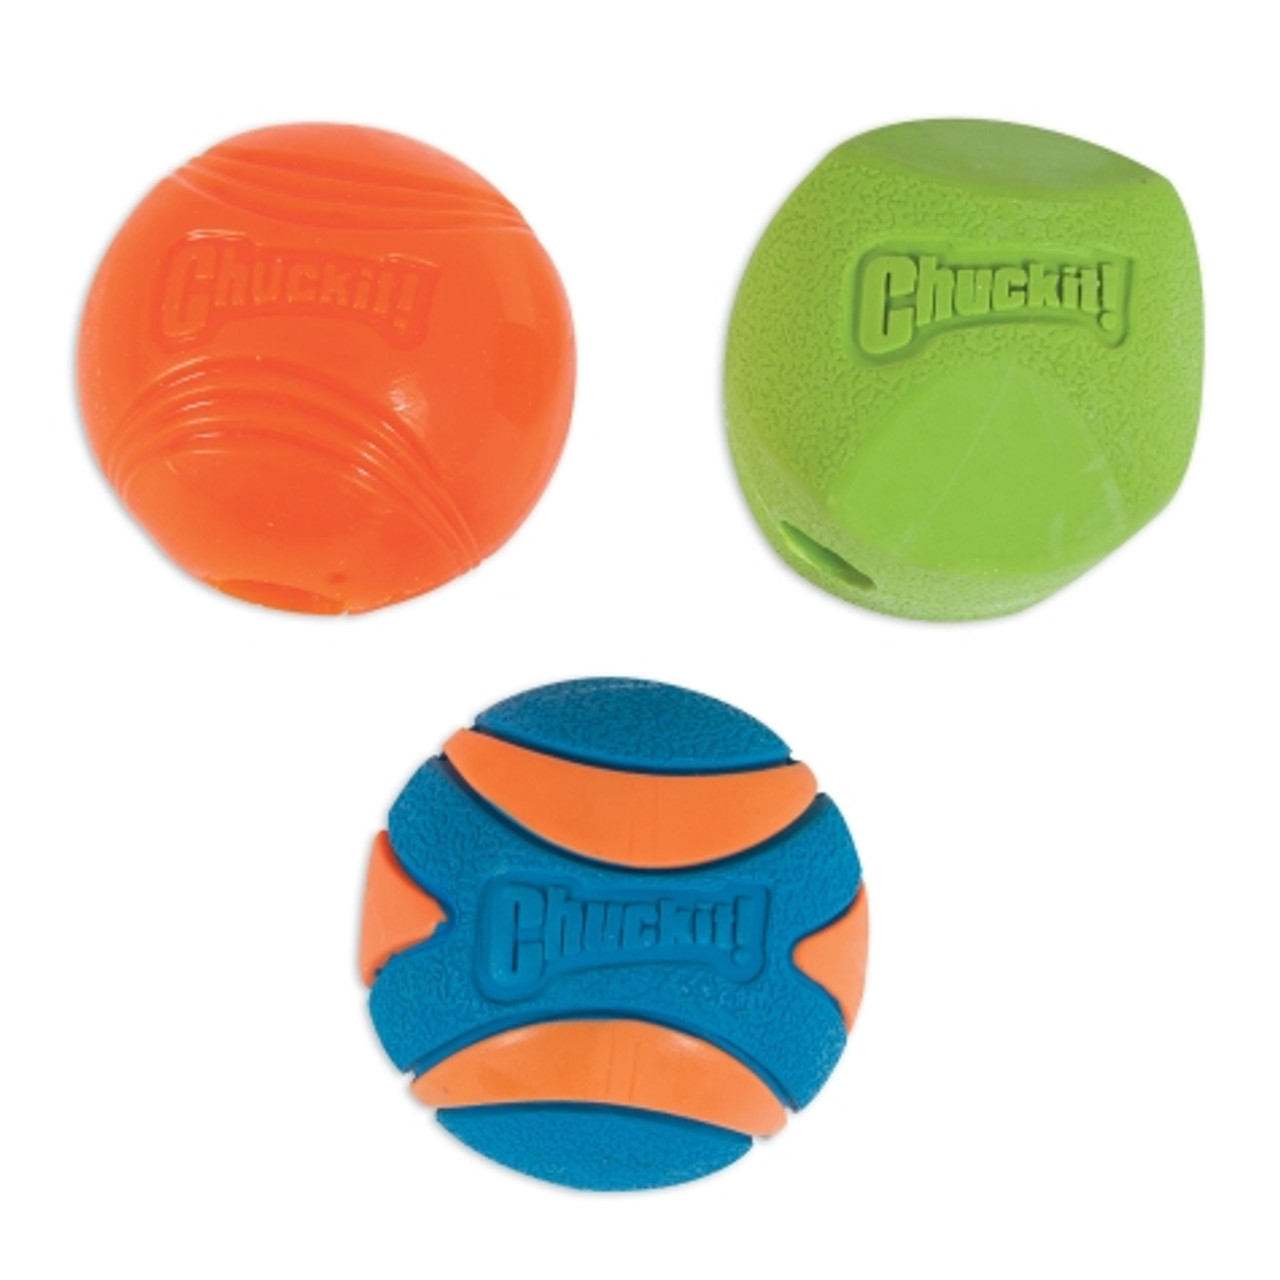 Chuckit! Fetch Medley 2 Triple Pack Ball Dog Toy